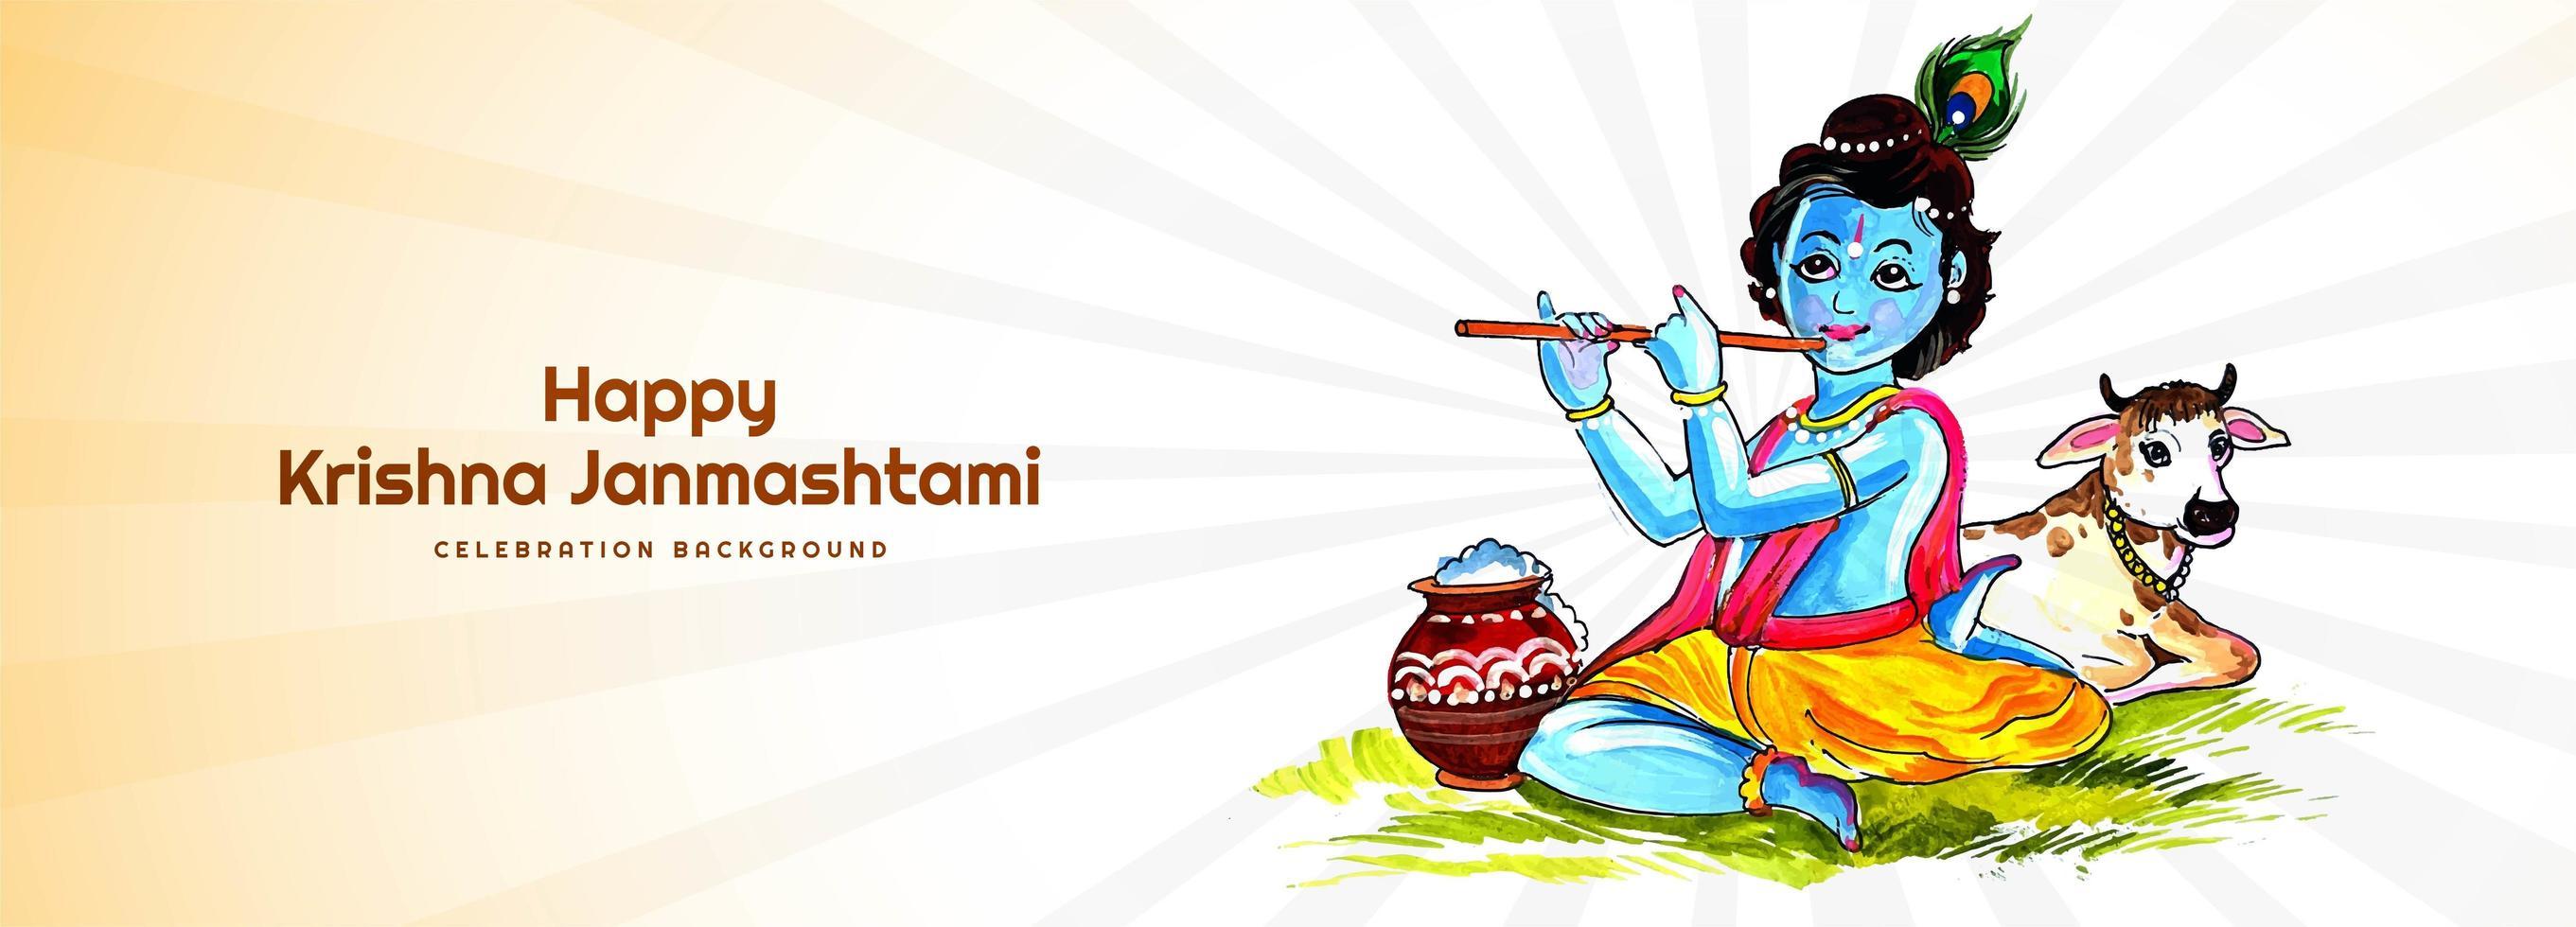 glad krishna janmashtami som spelar flöjt festival banner vektor